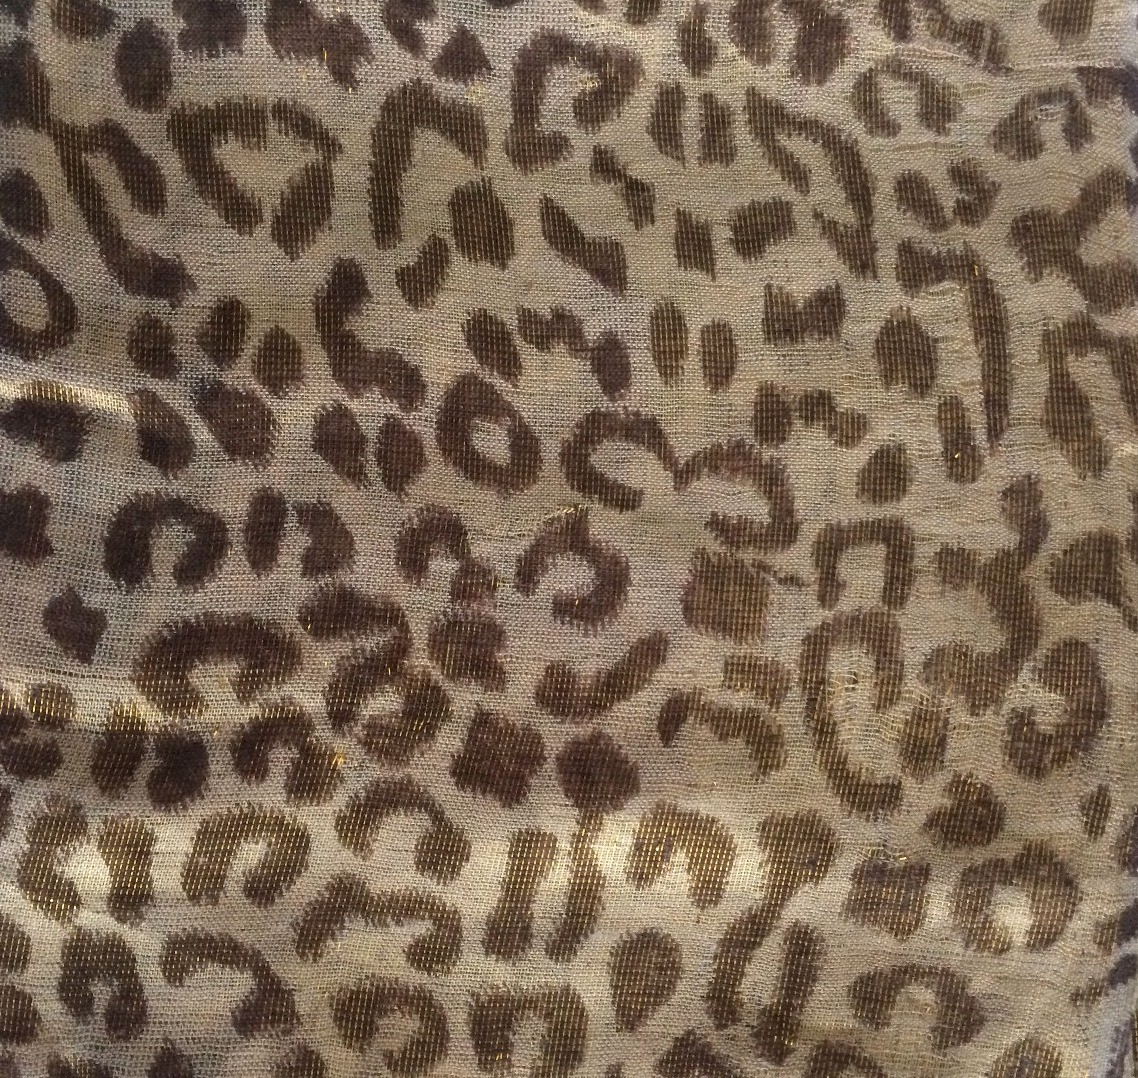 Beige shimmering animal print tichel